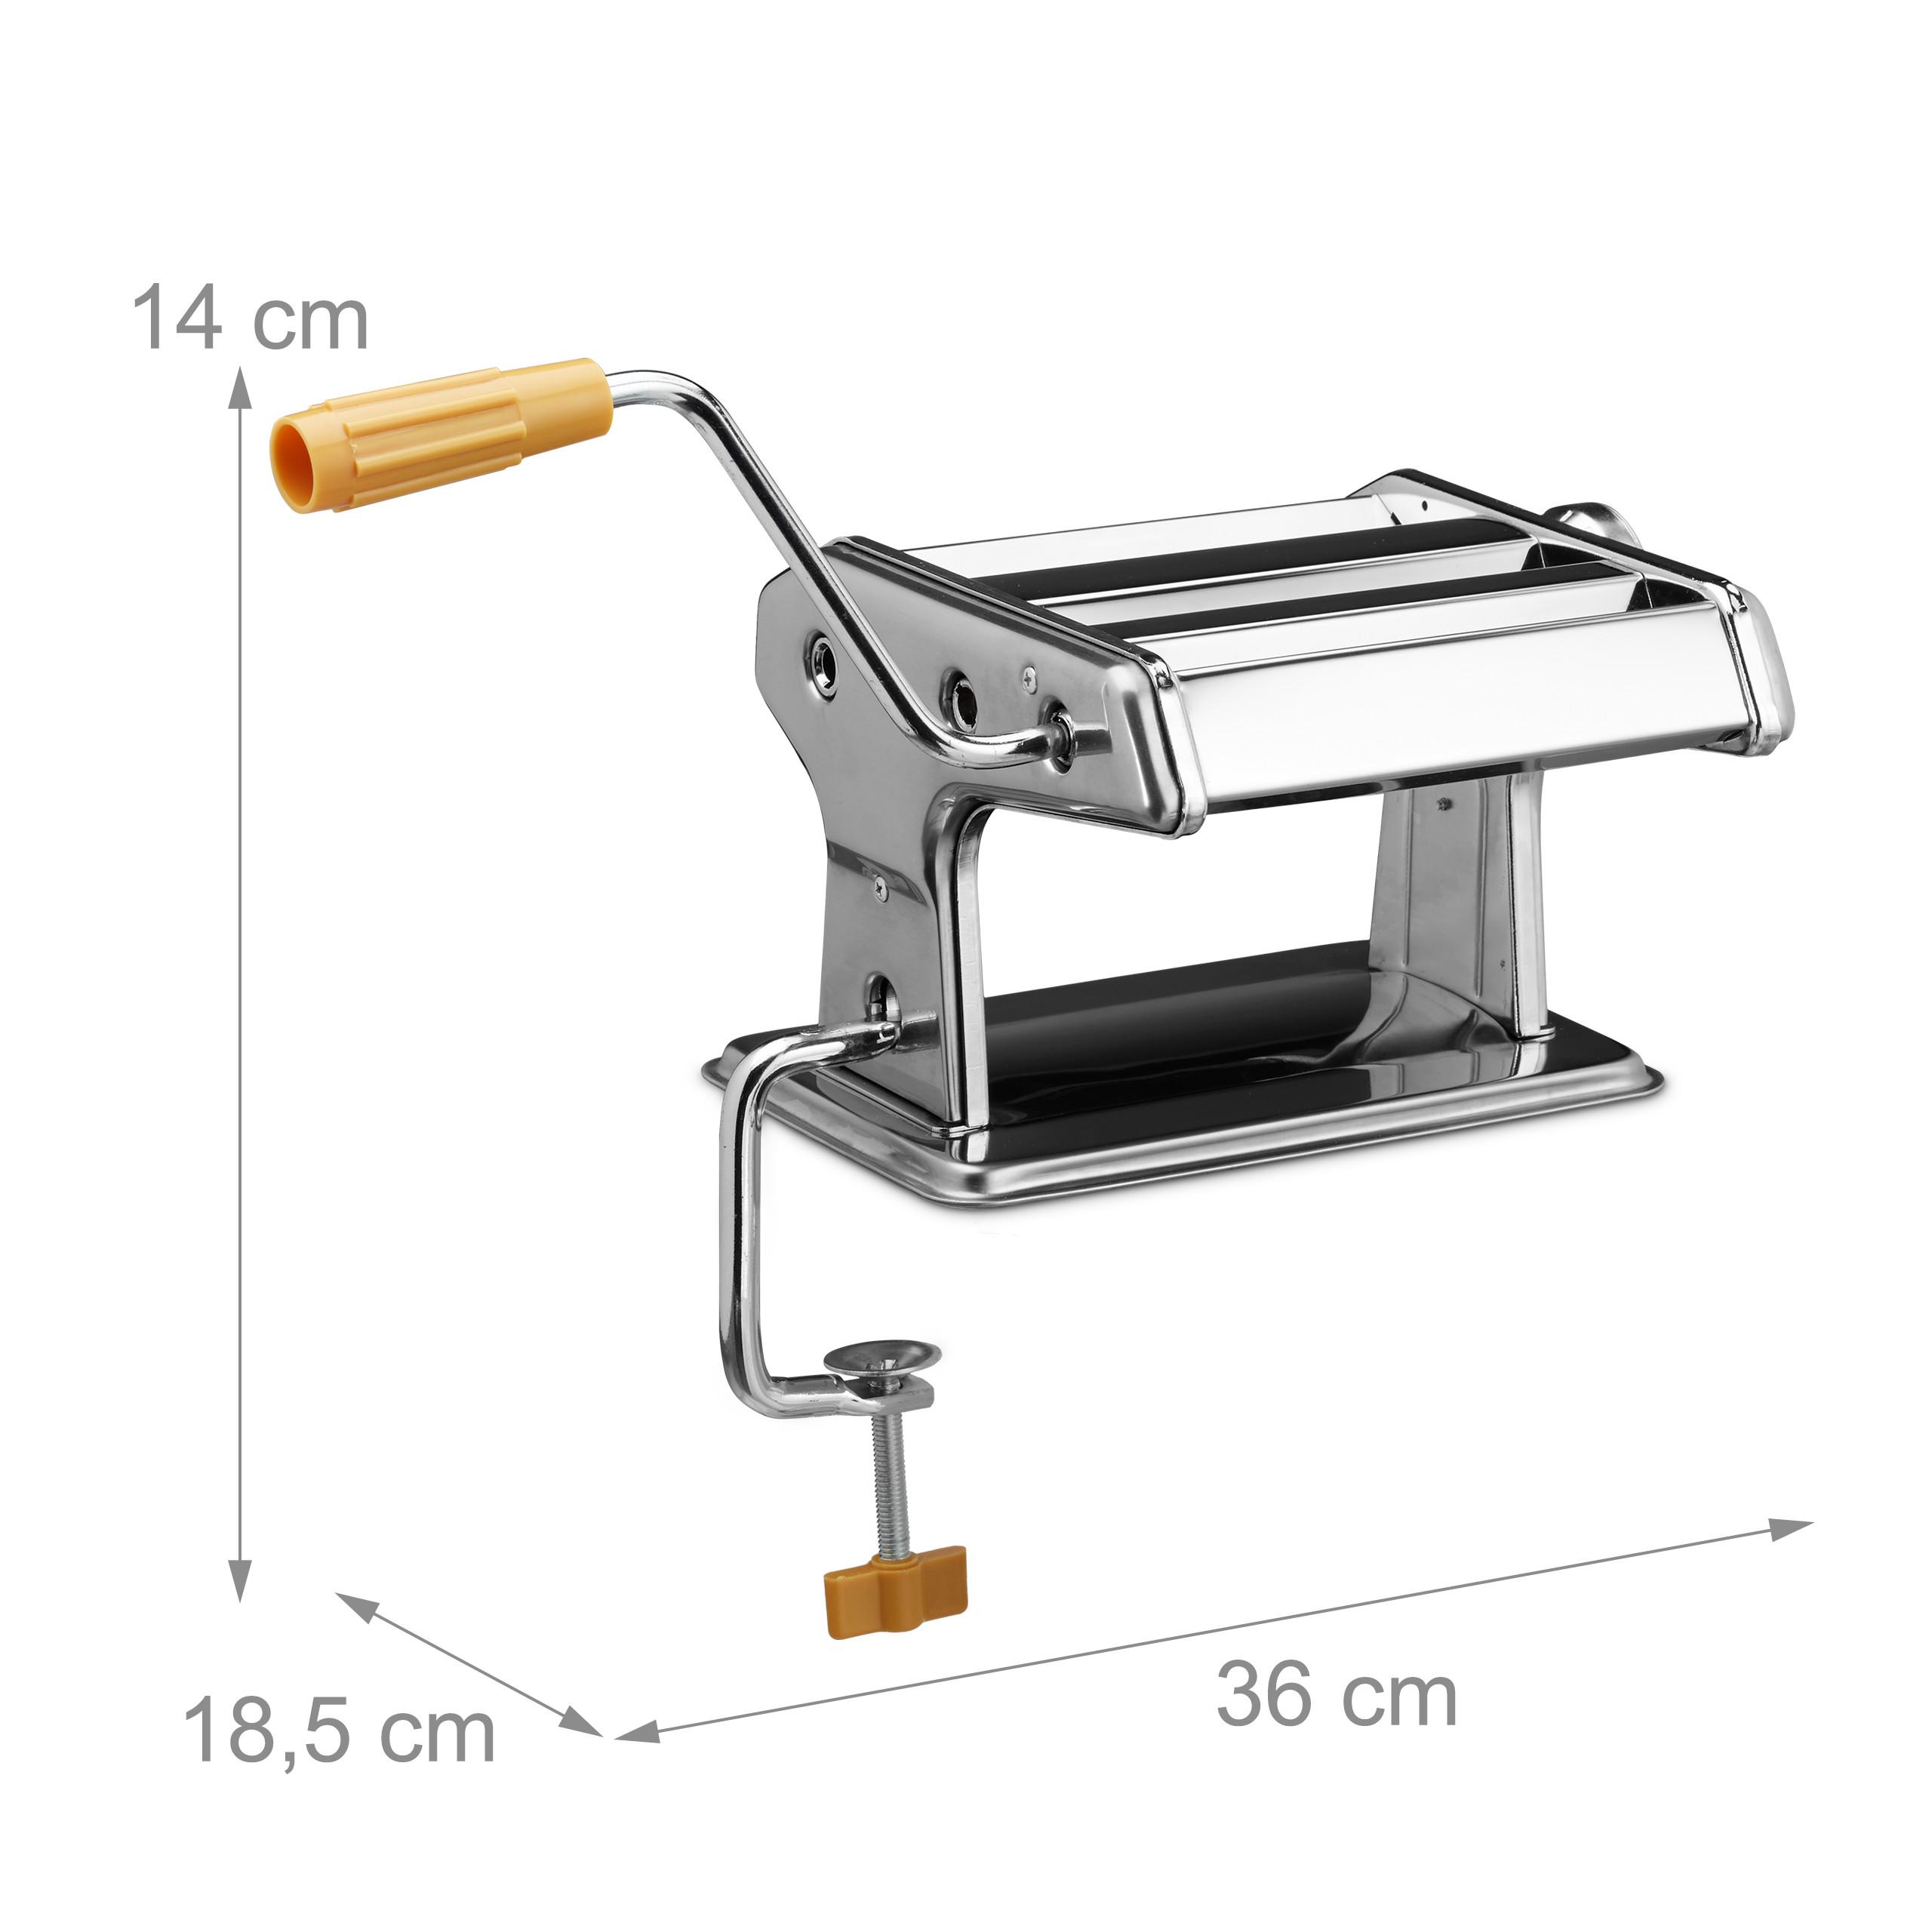 machine p tes manuelle chrom p tes fra ches ebay. Black Bedroom Furniture Sets. Home Design Ideas